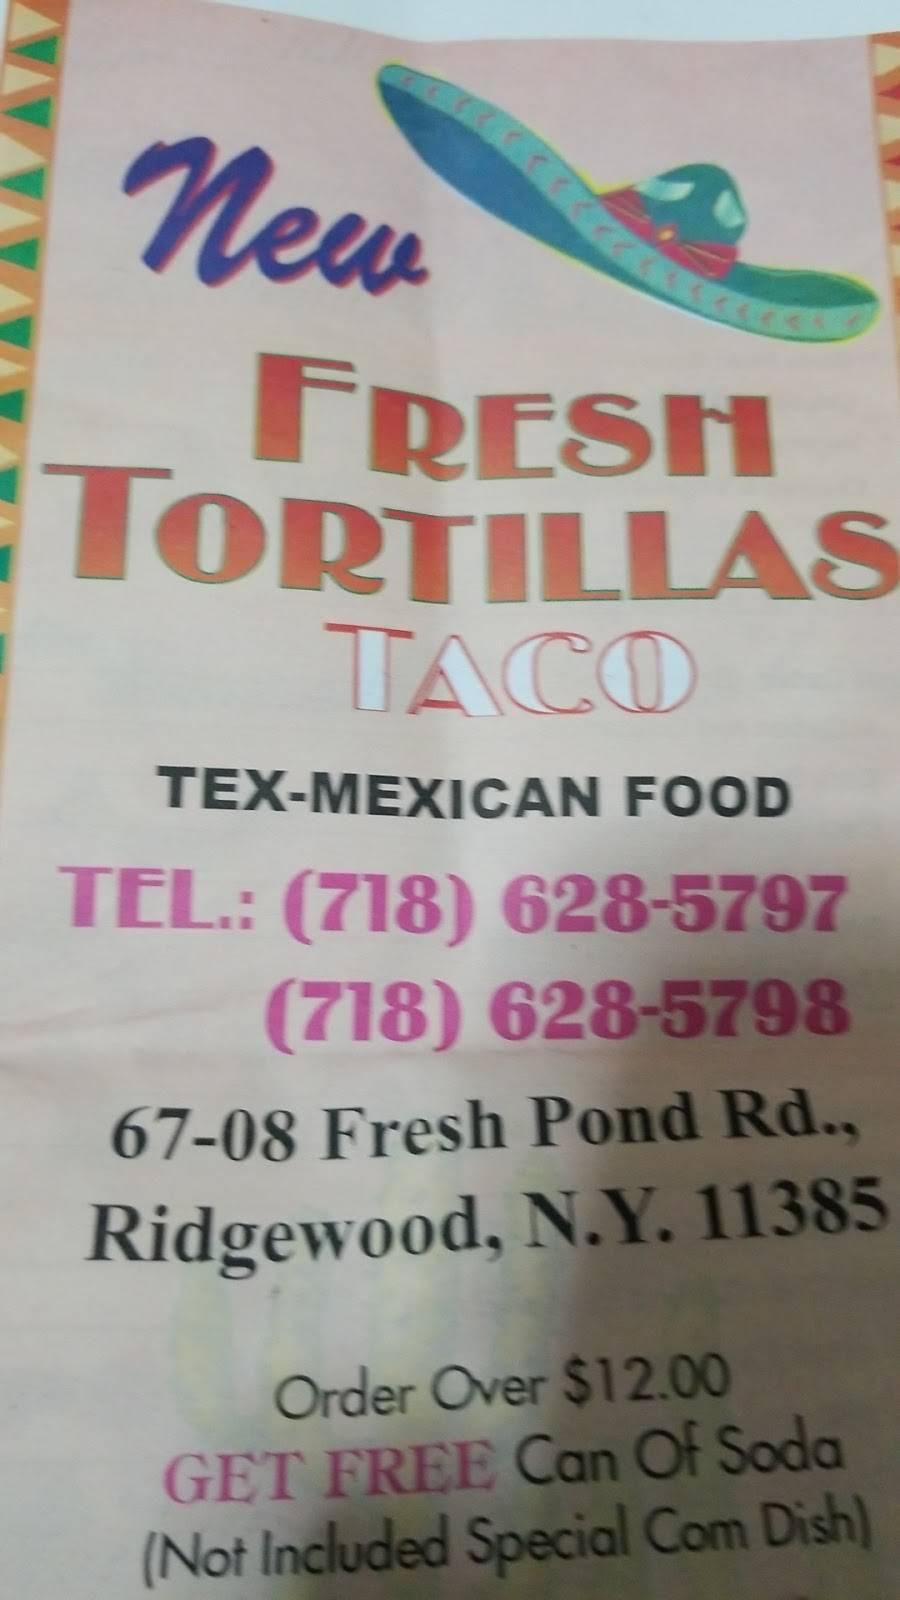 New Fresh Tortillas Taco   restaurant   67-08 Fresh Pond Rd, Flushing, NY 11385, USA   7186285797 OR +1 718-628-5797